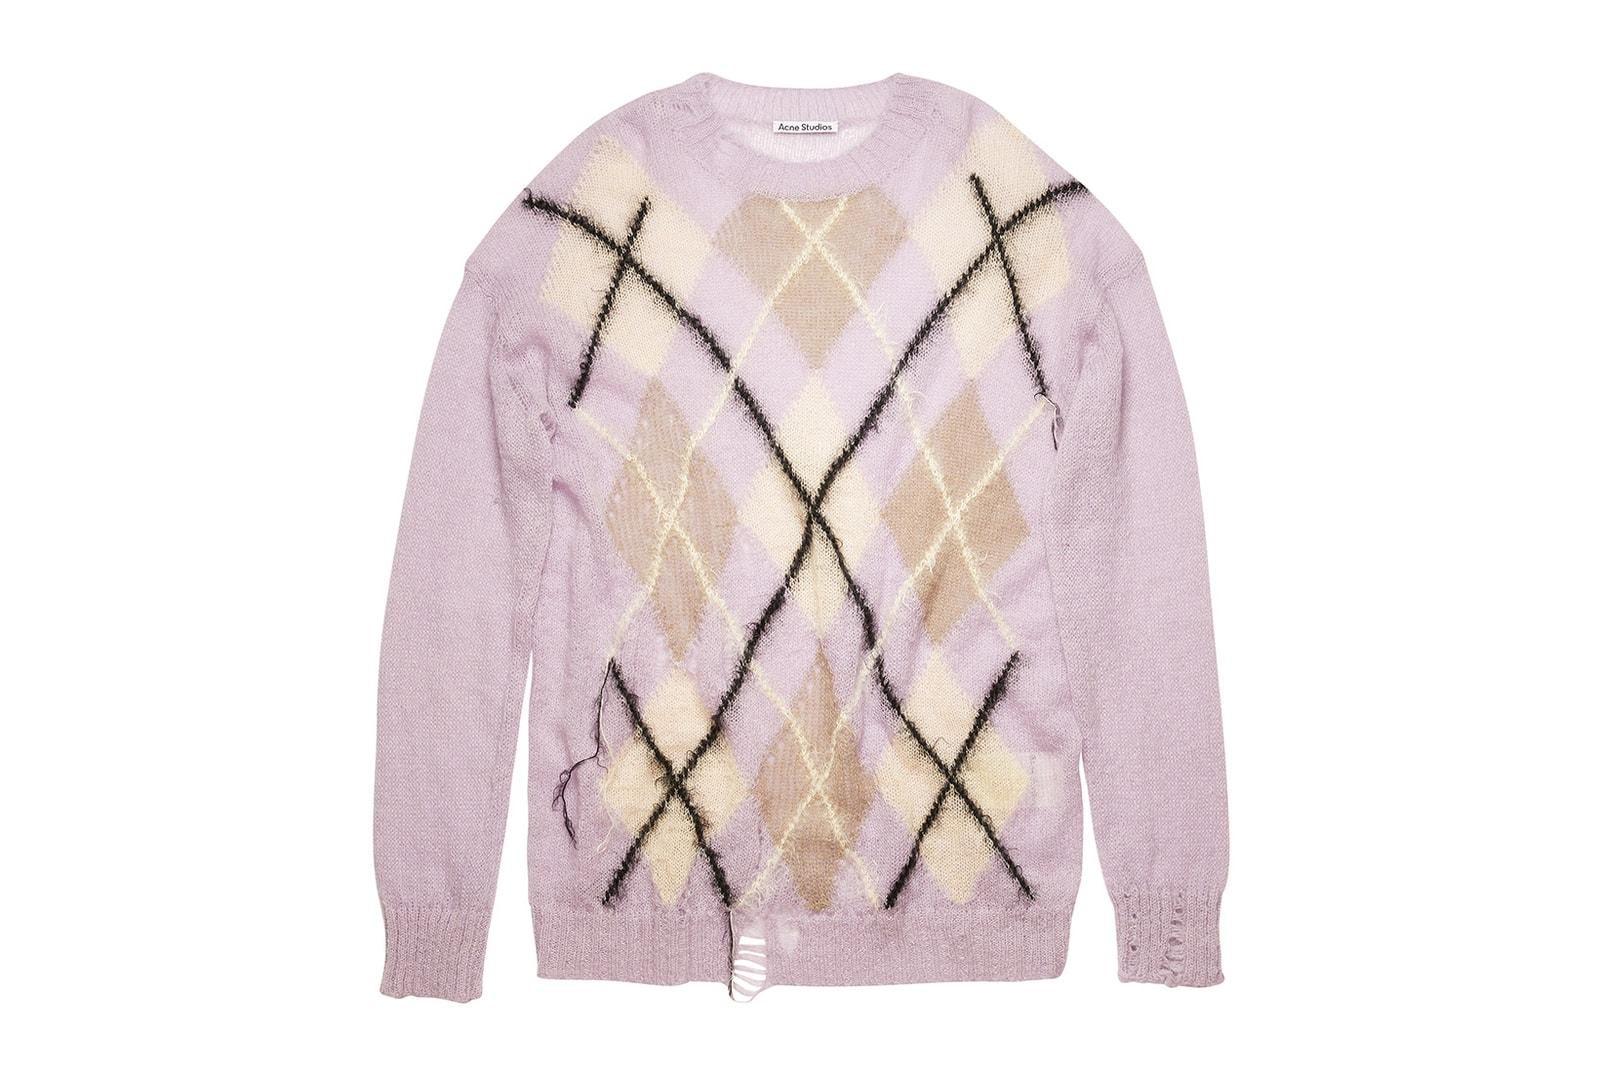 acne studios fall winter campaign dogs pets employees shirts flannels hoodies blazers coats jonny johansson